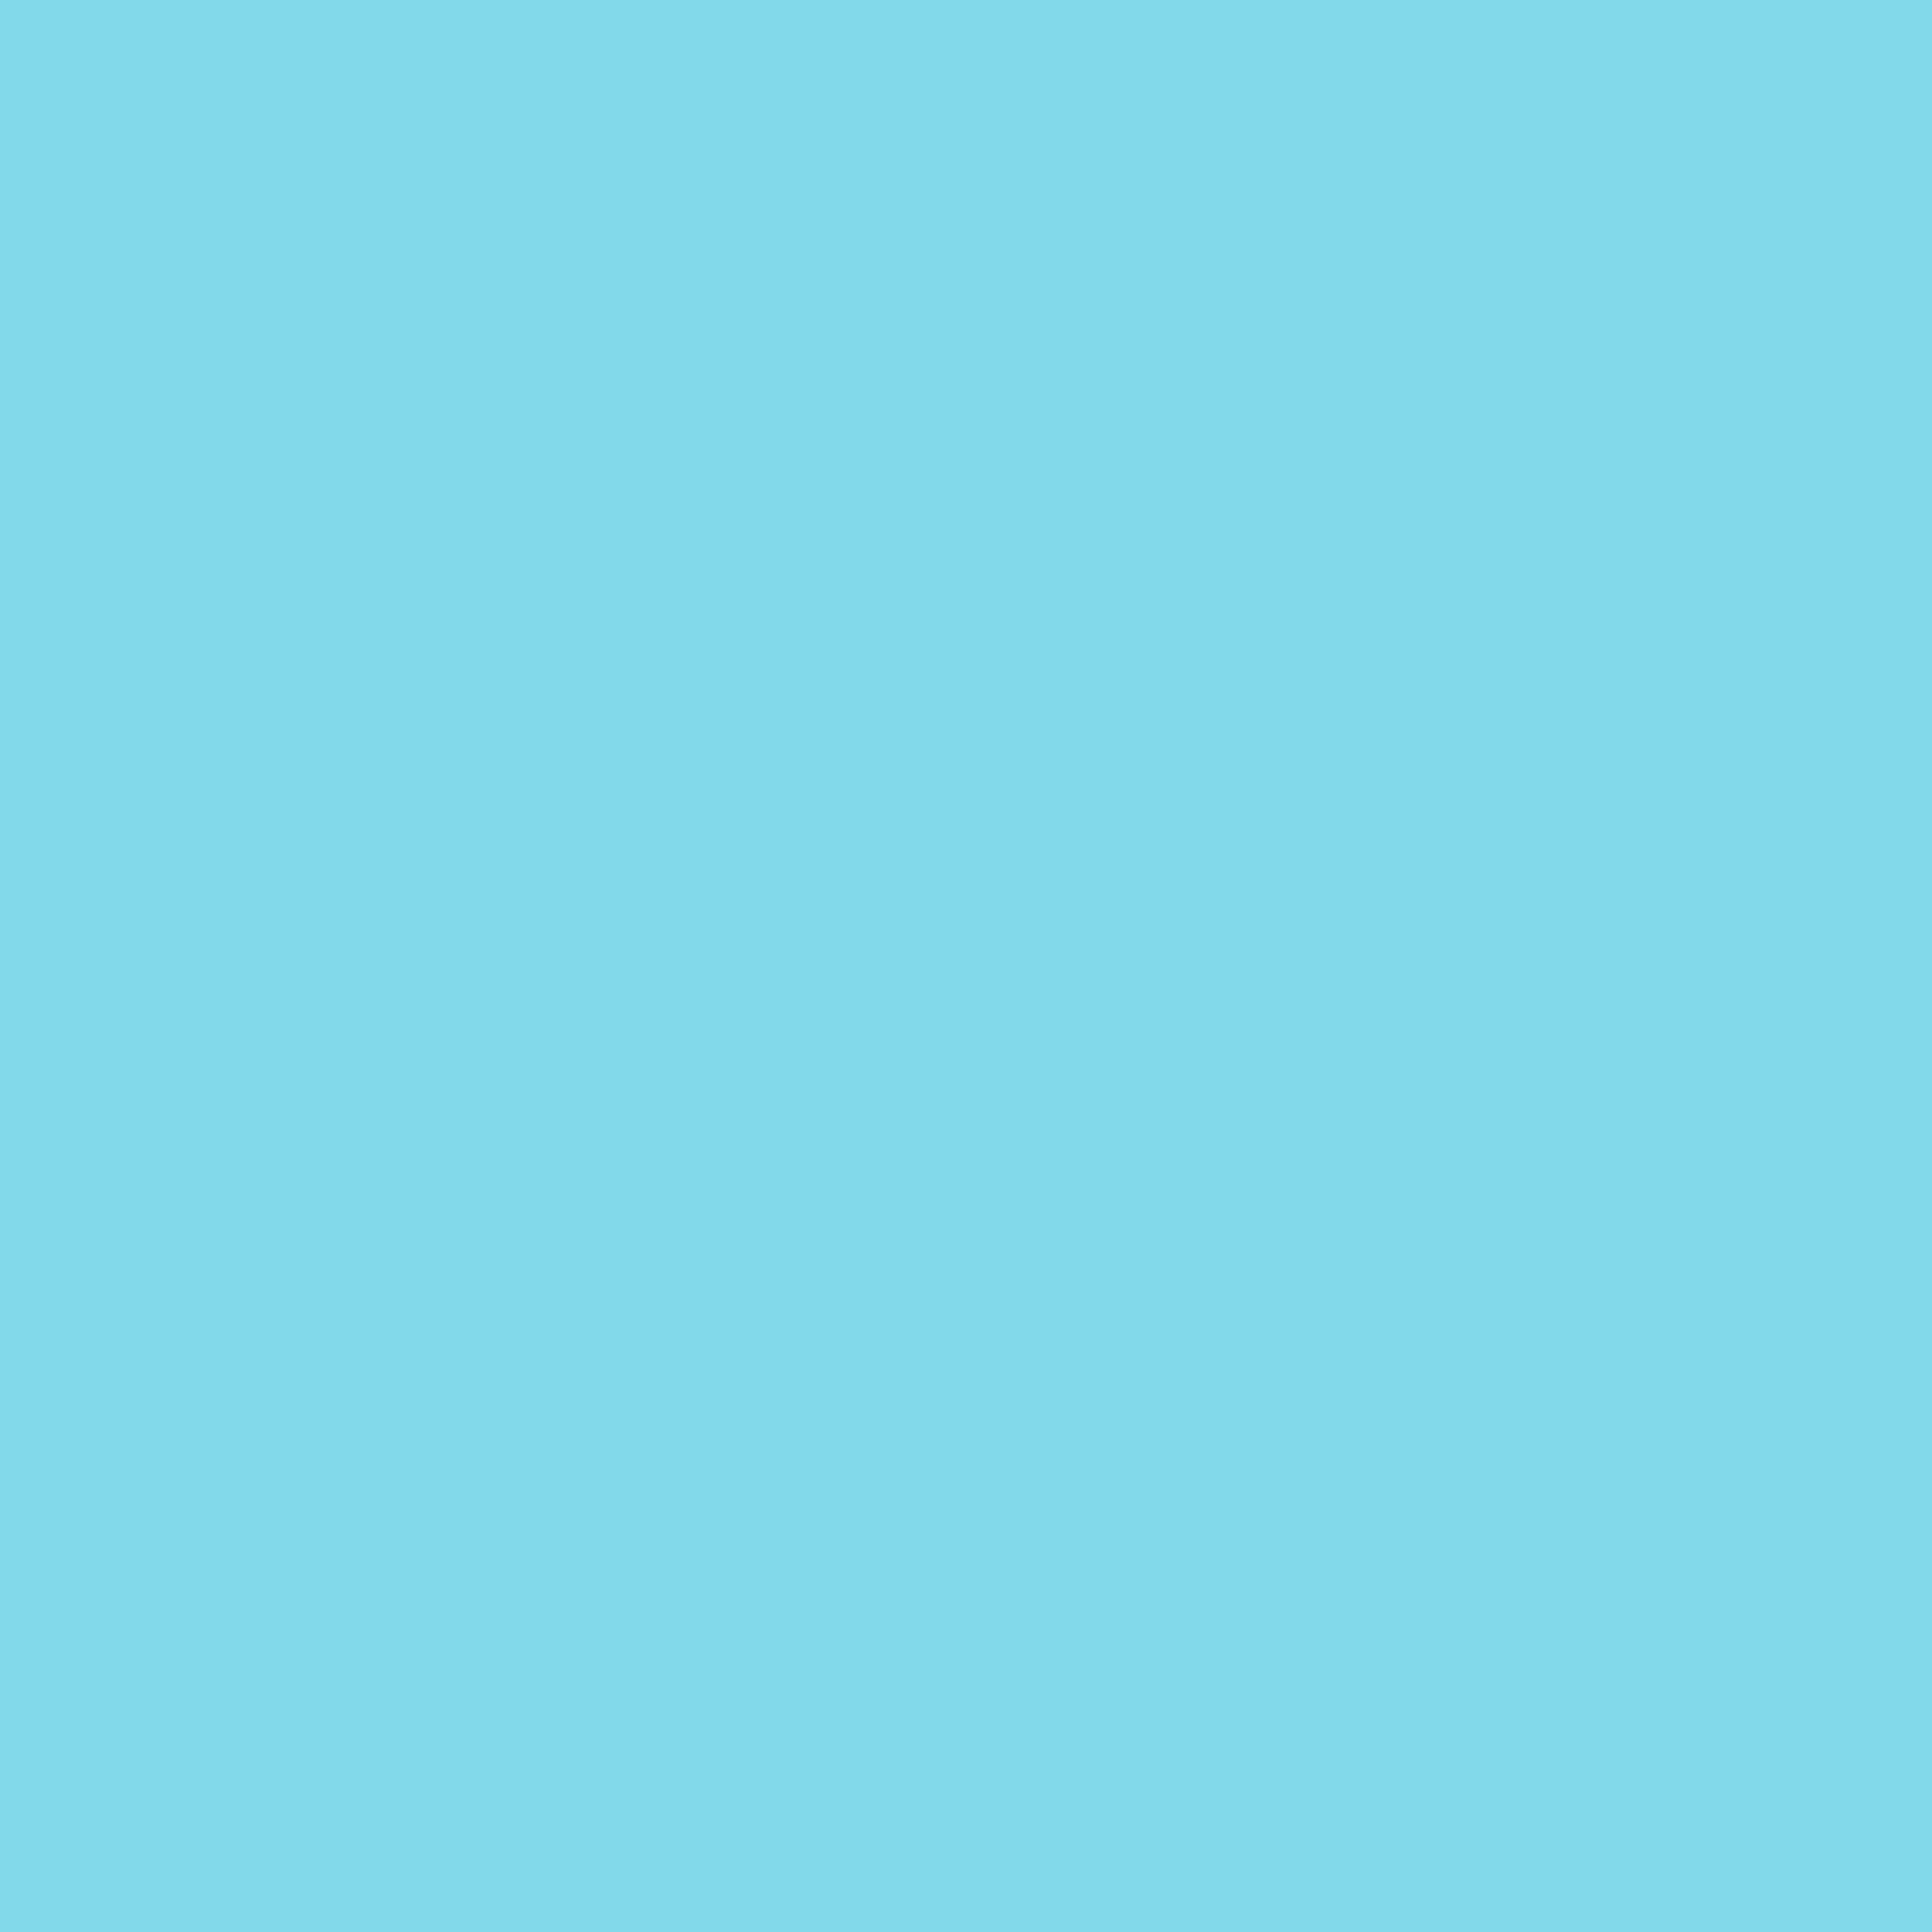 2732x2732 Medium Sky Blue Solid Color Background